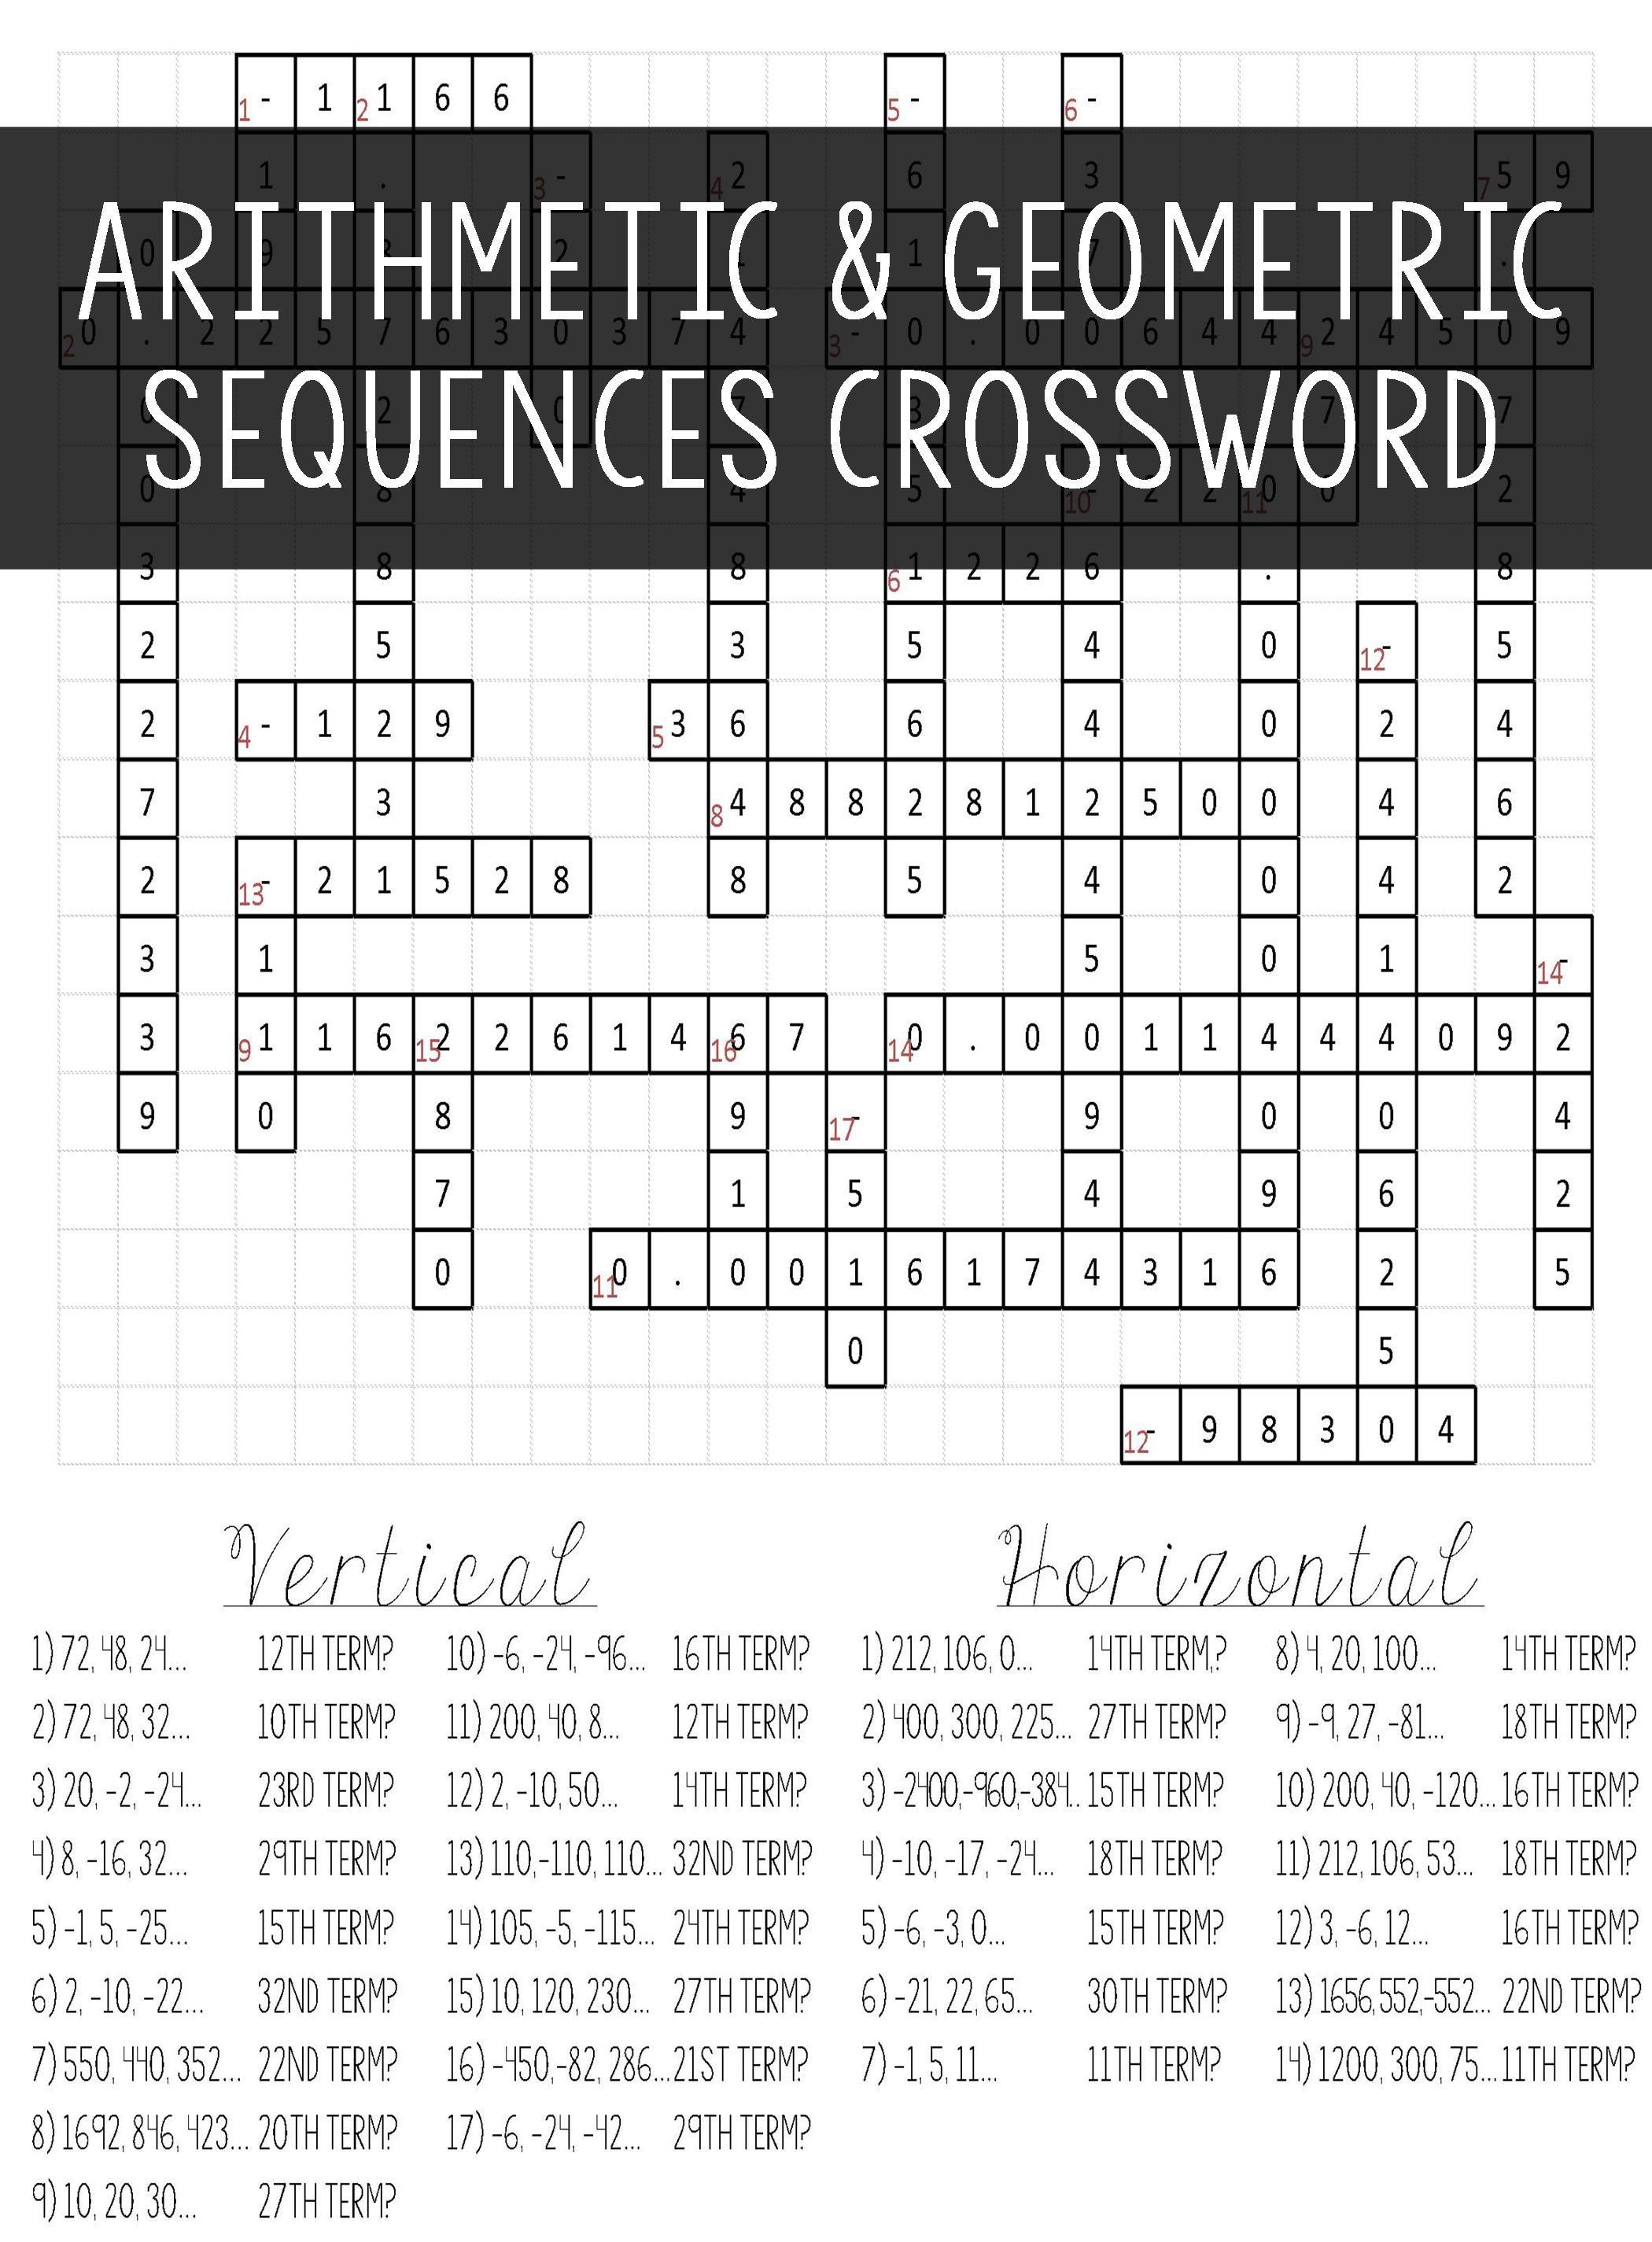 Arithmetic \u0026 Geometric Sequences Crossword Puzzle Activity Worksheet    Arithmetic sequences [ 2850 x 2100 Pixel ]